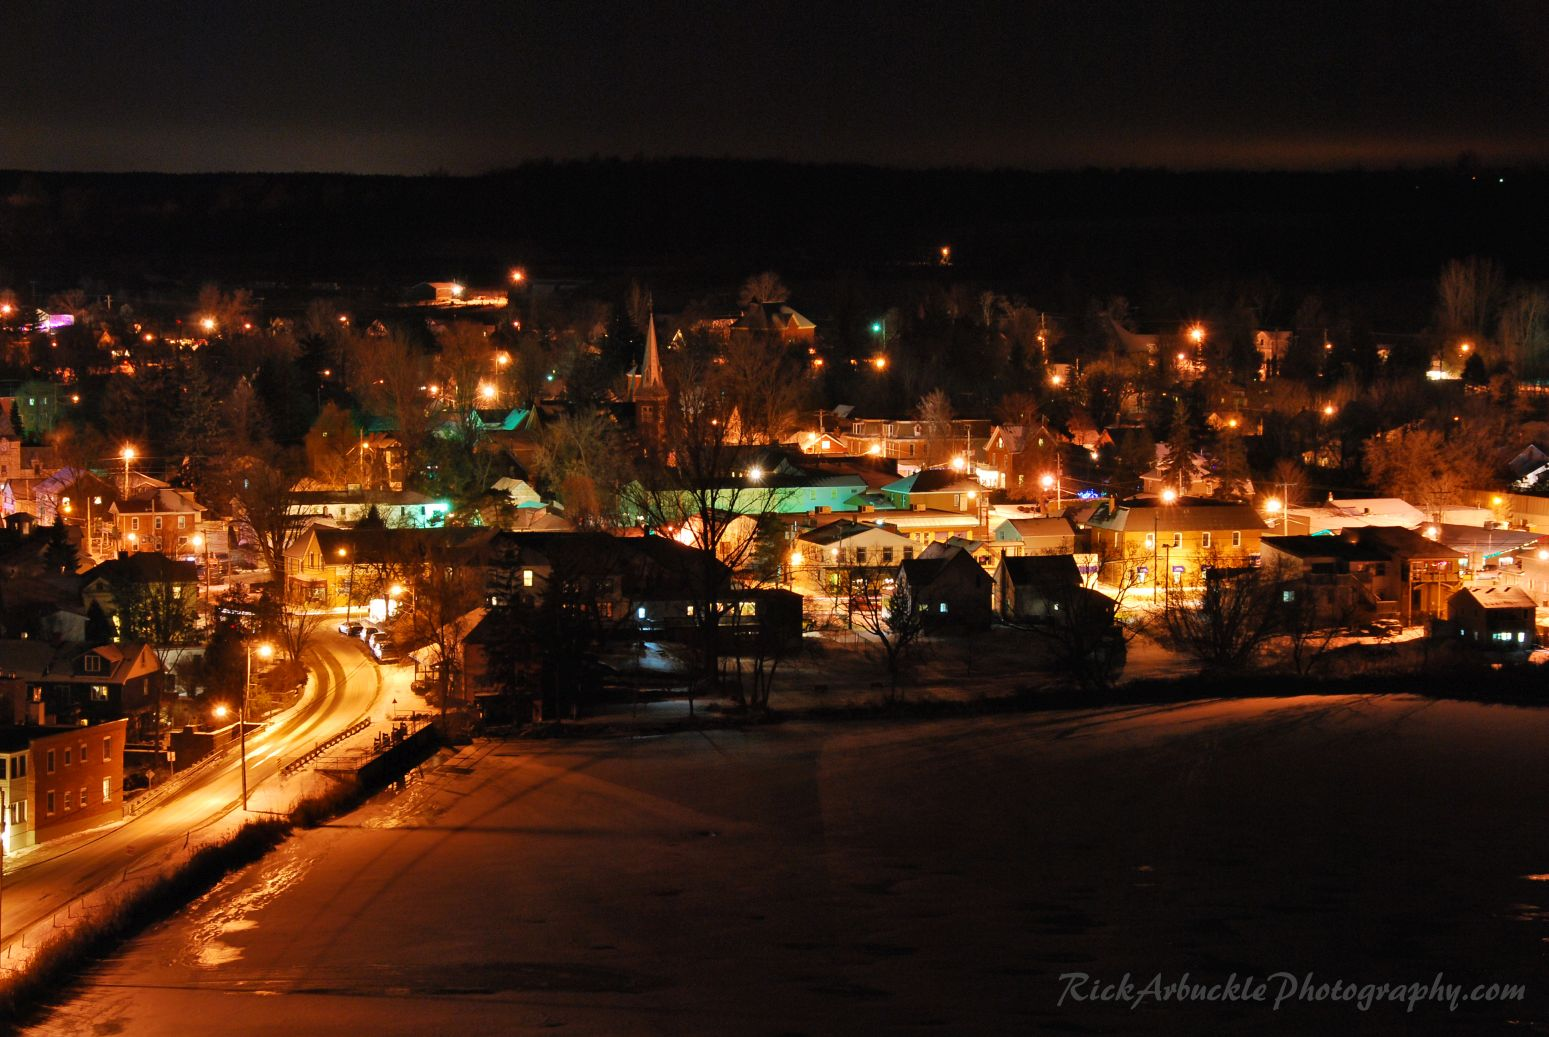 Village Winter Night copy.jpg